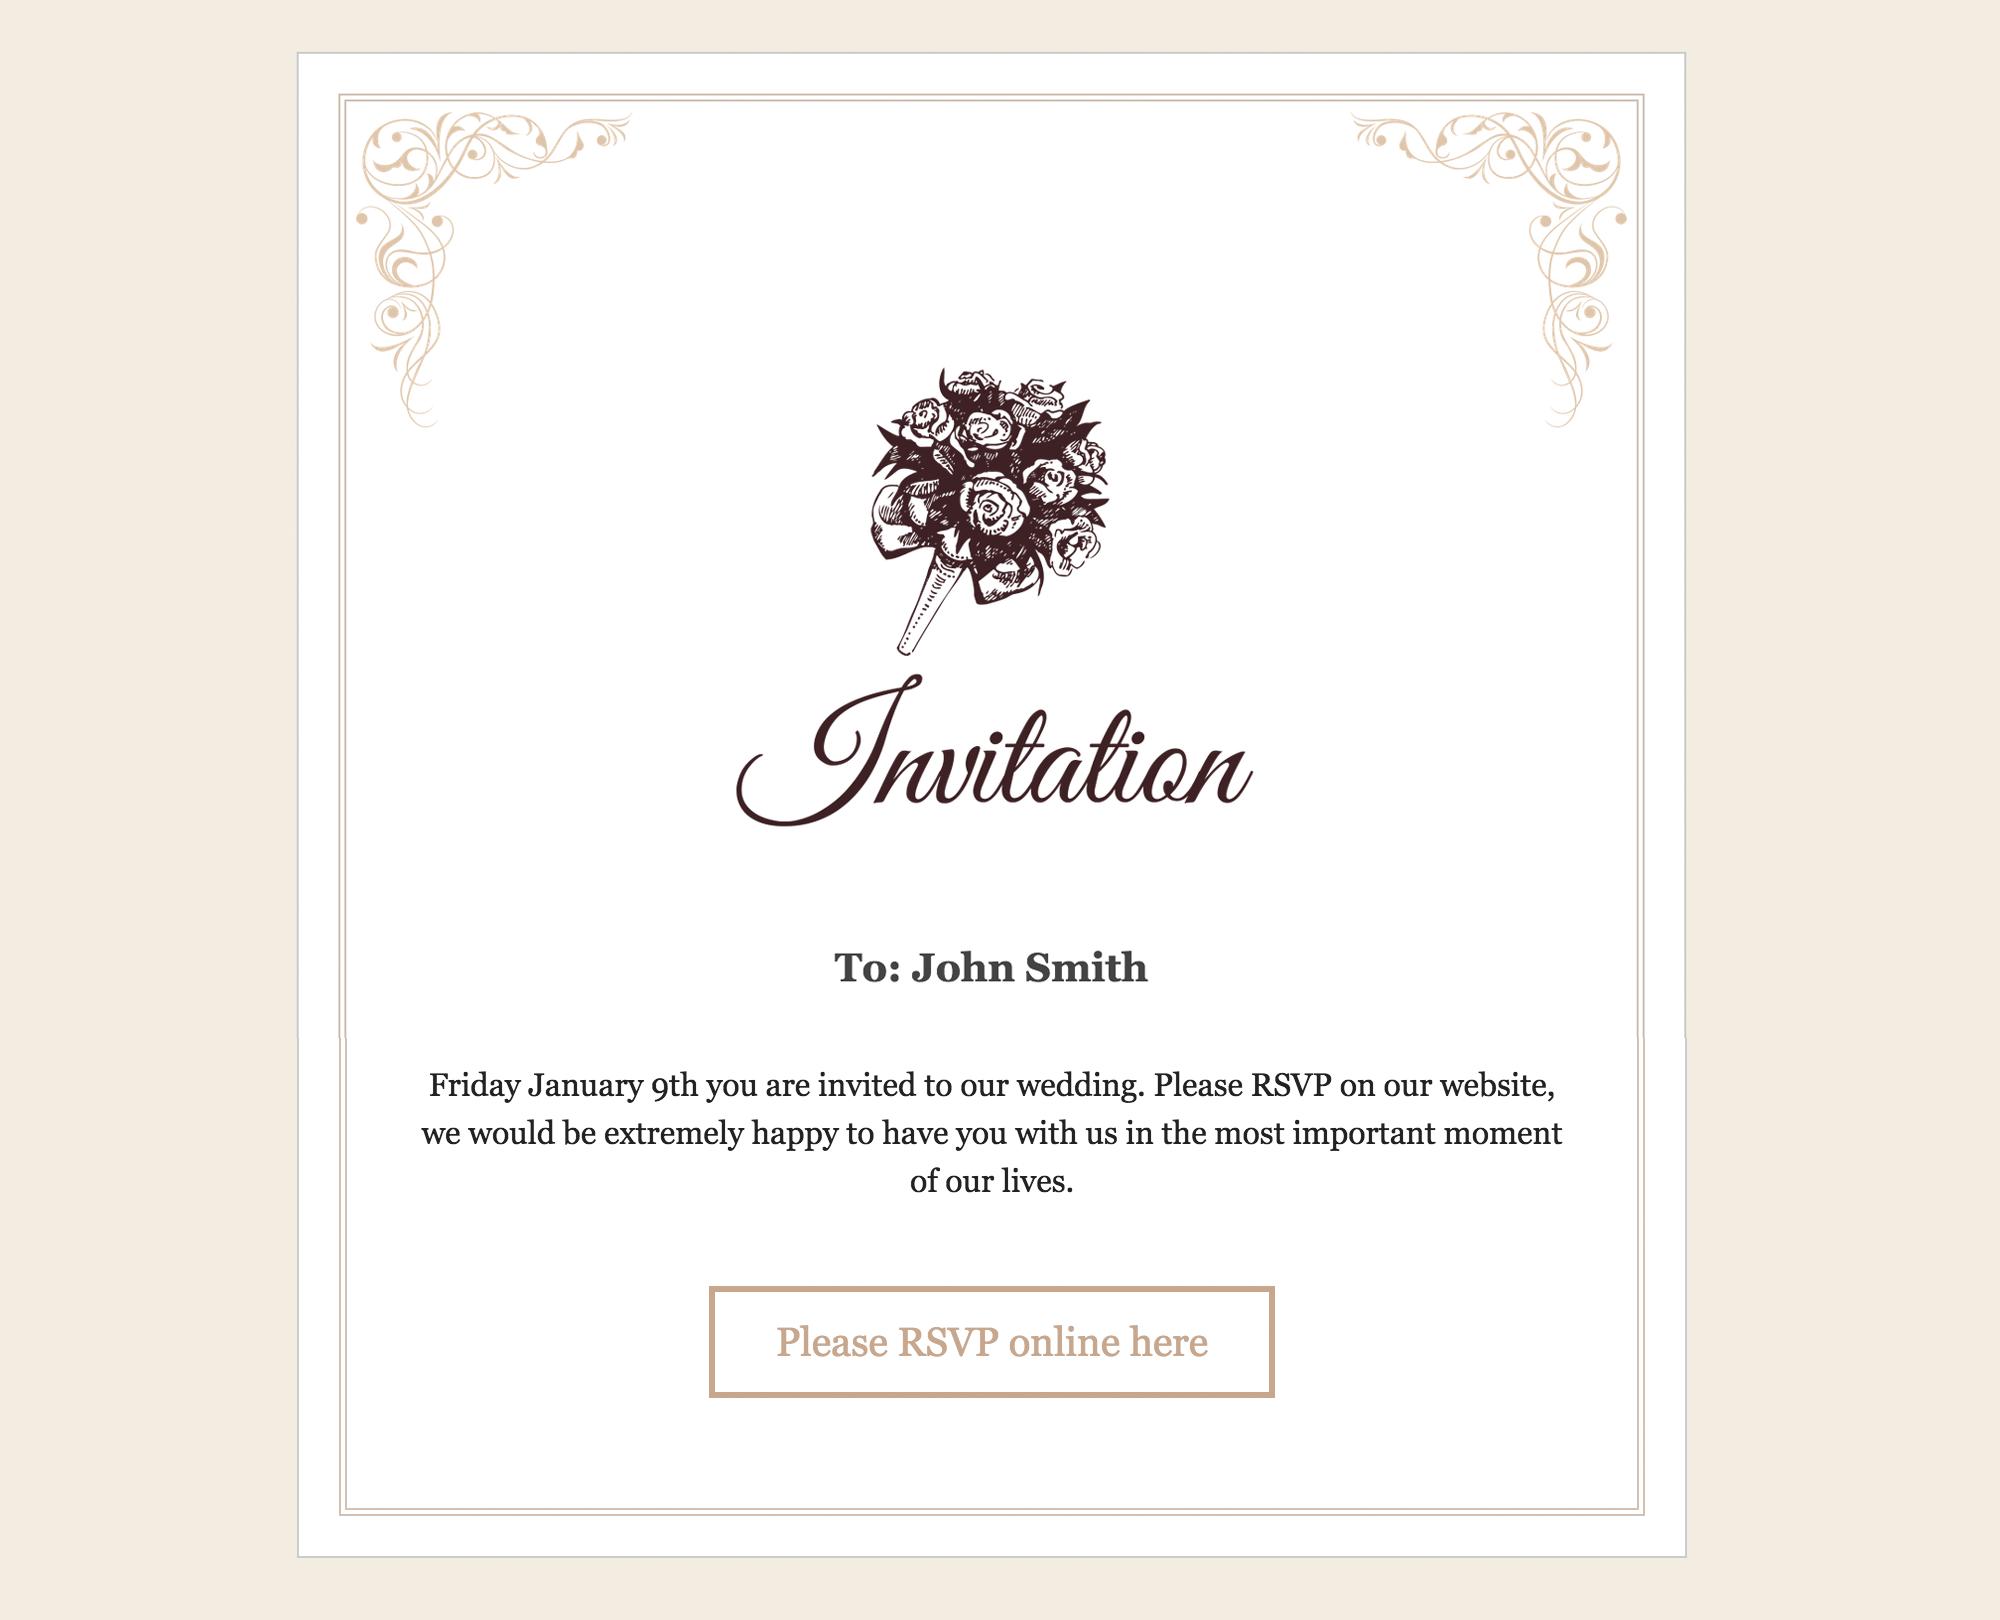 RSVP And Wedding Invitation Plugin Documentation